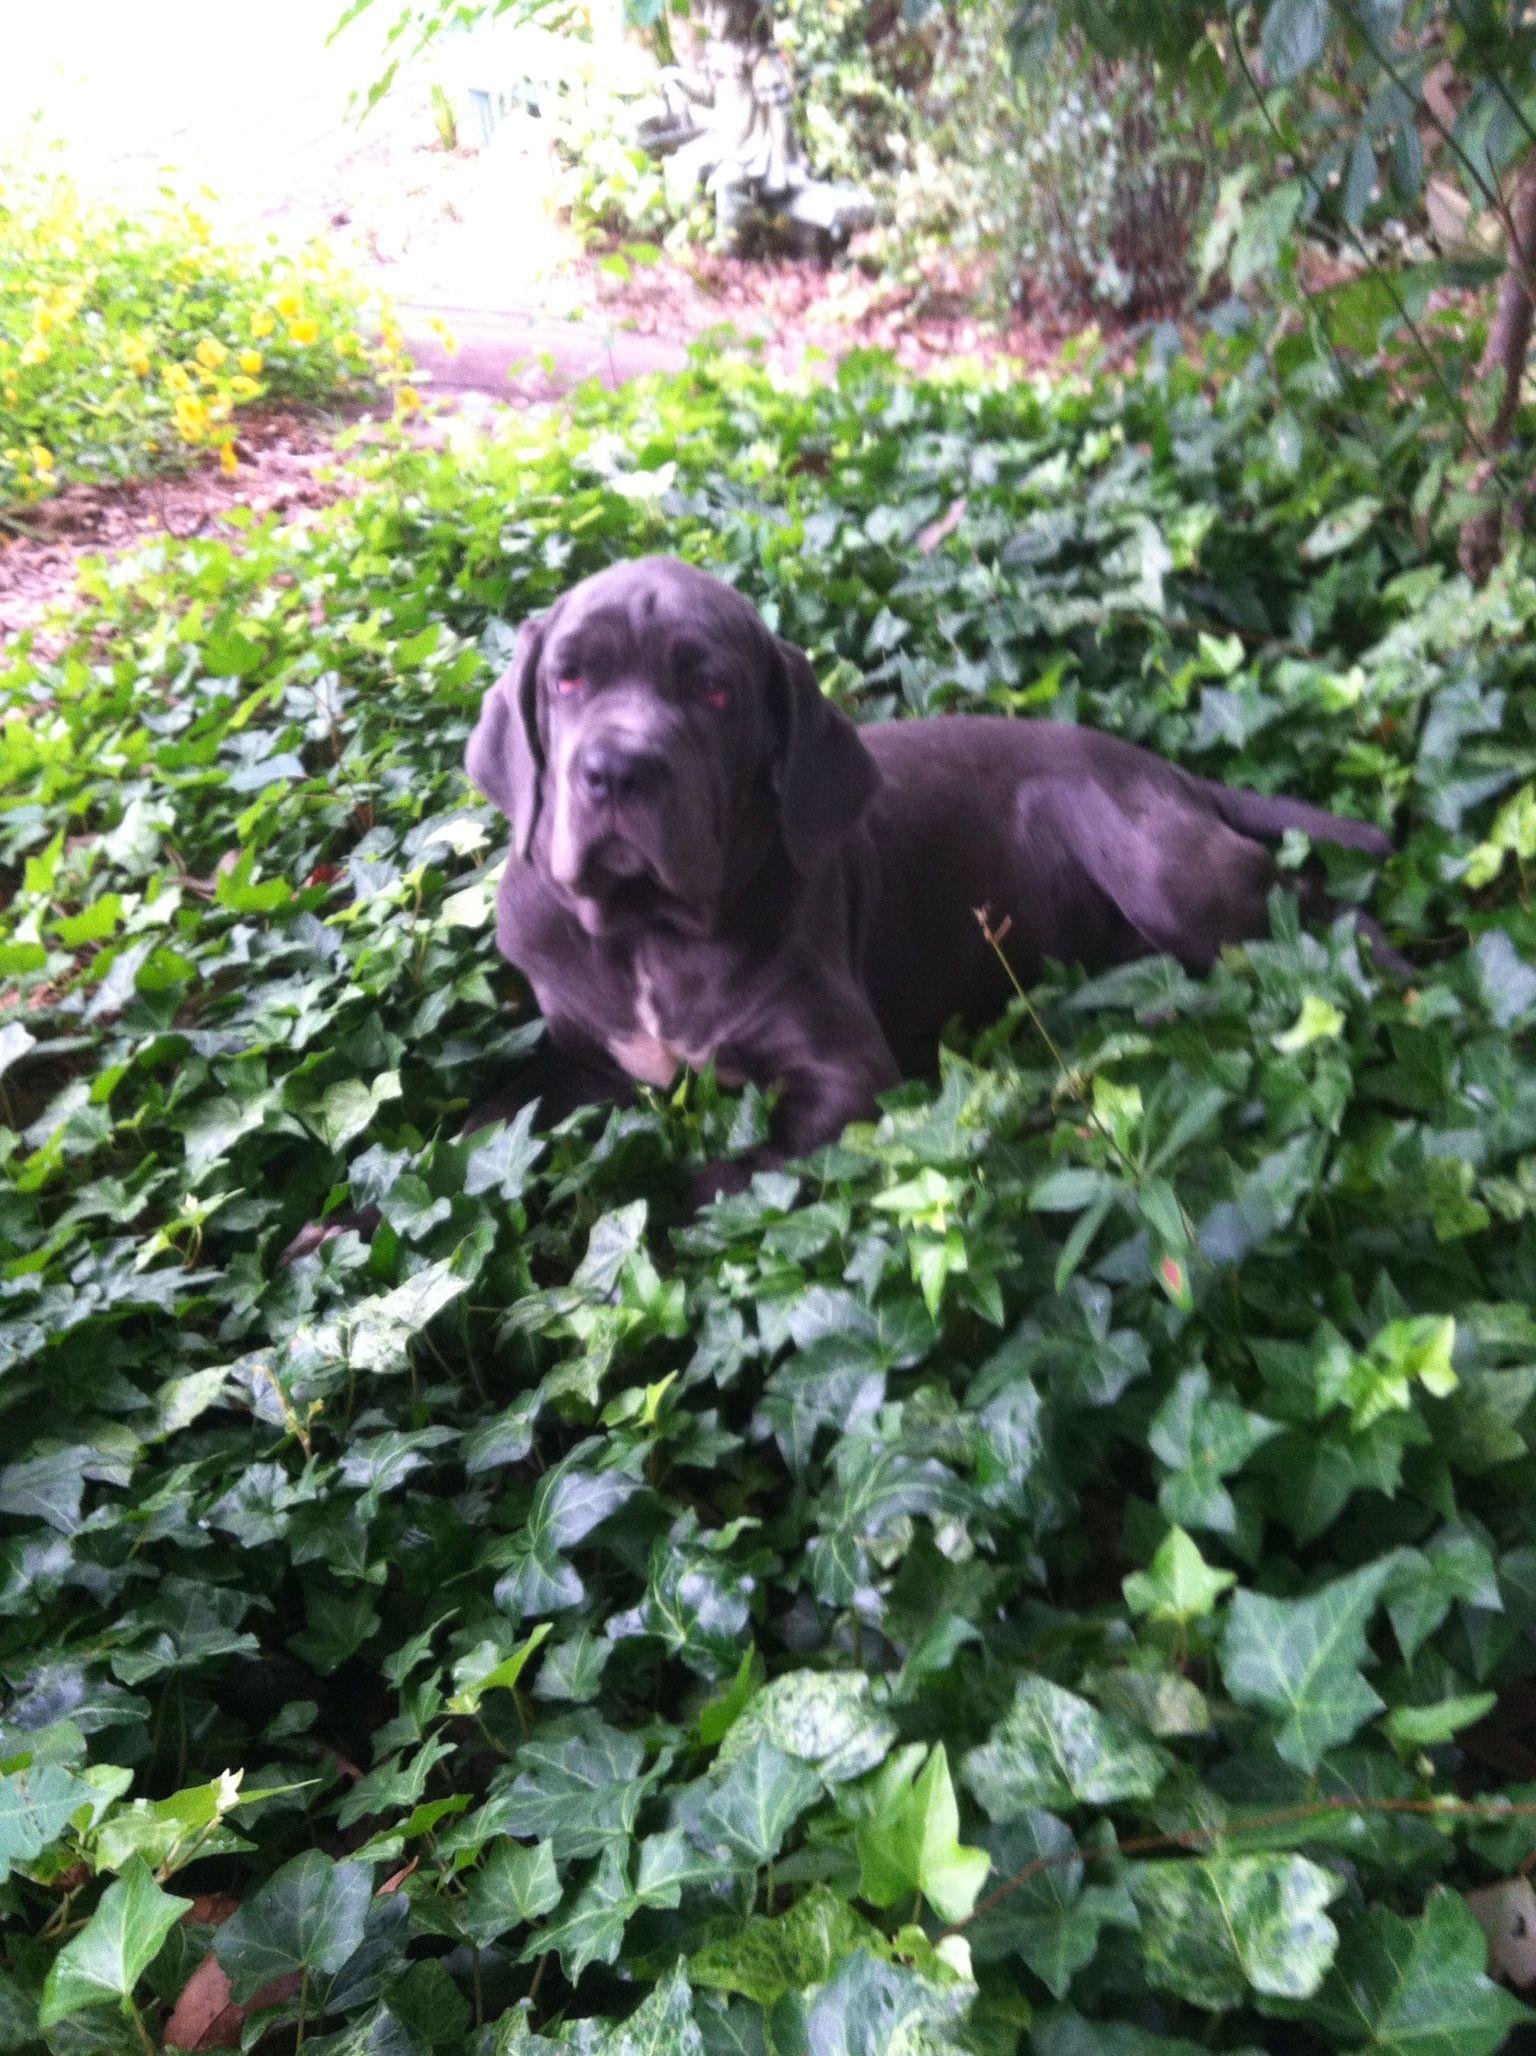 My neopolitan mastiff puppy i never knew doggy love like